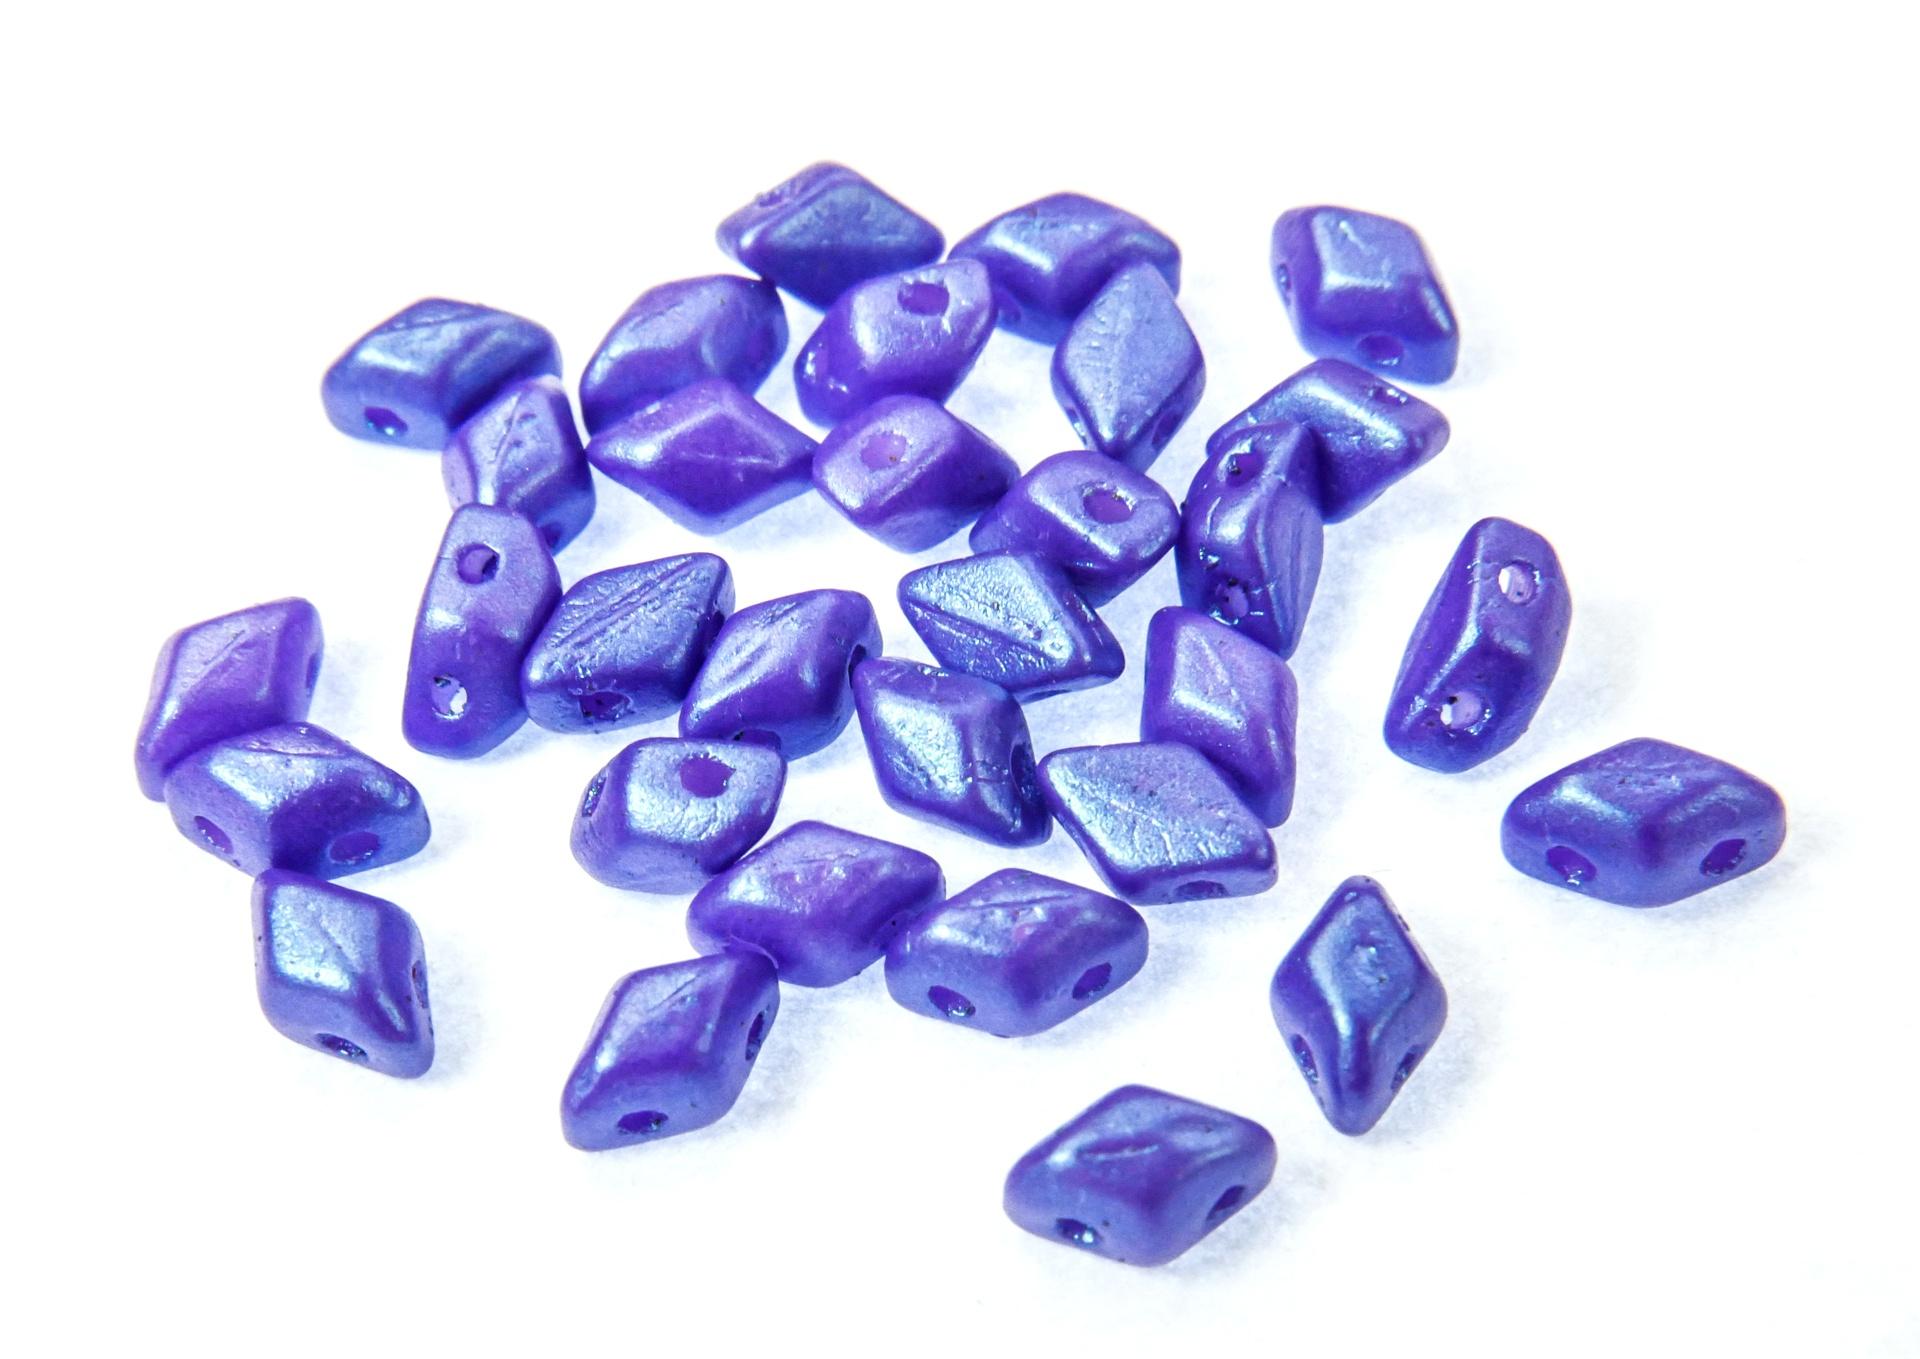 Czech Pressed Glass Beads / Czech Glass & Japanese Two Hole Beads / Mini GemDuo Beads